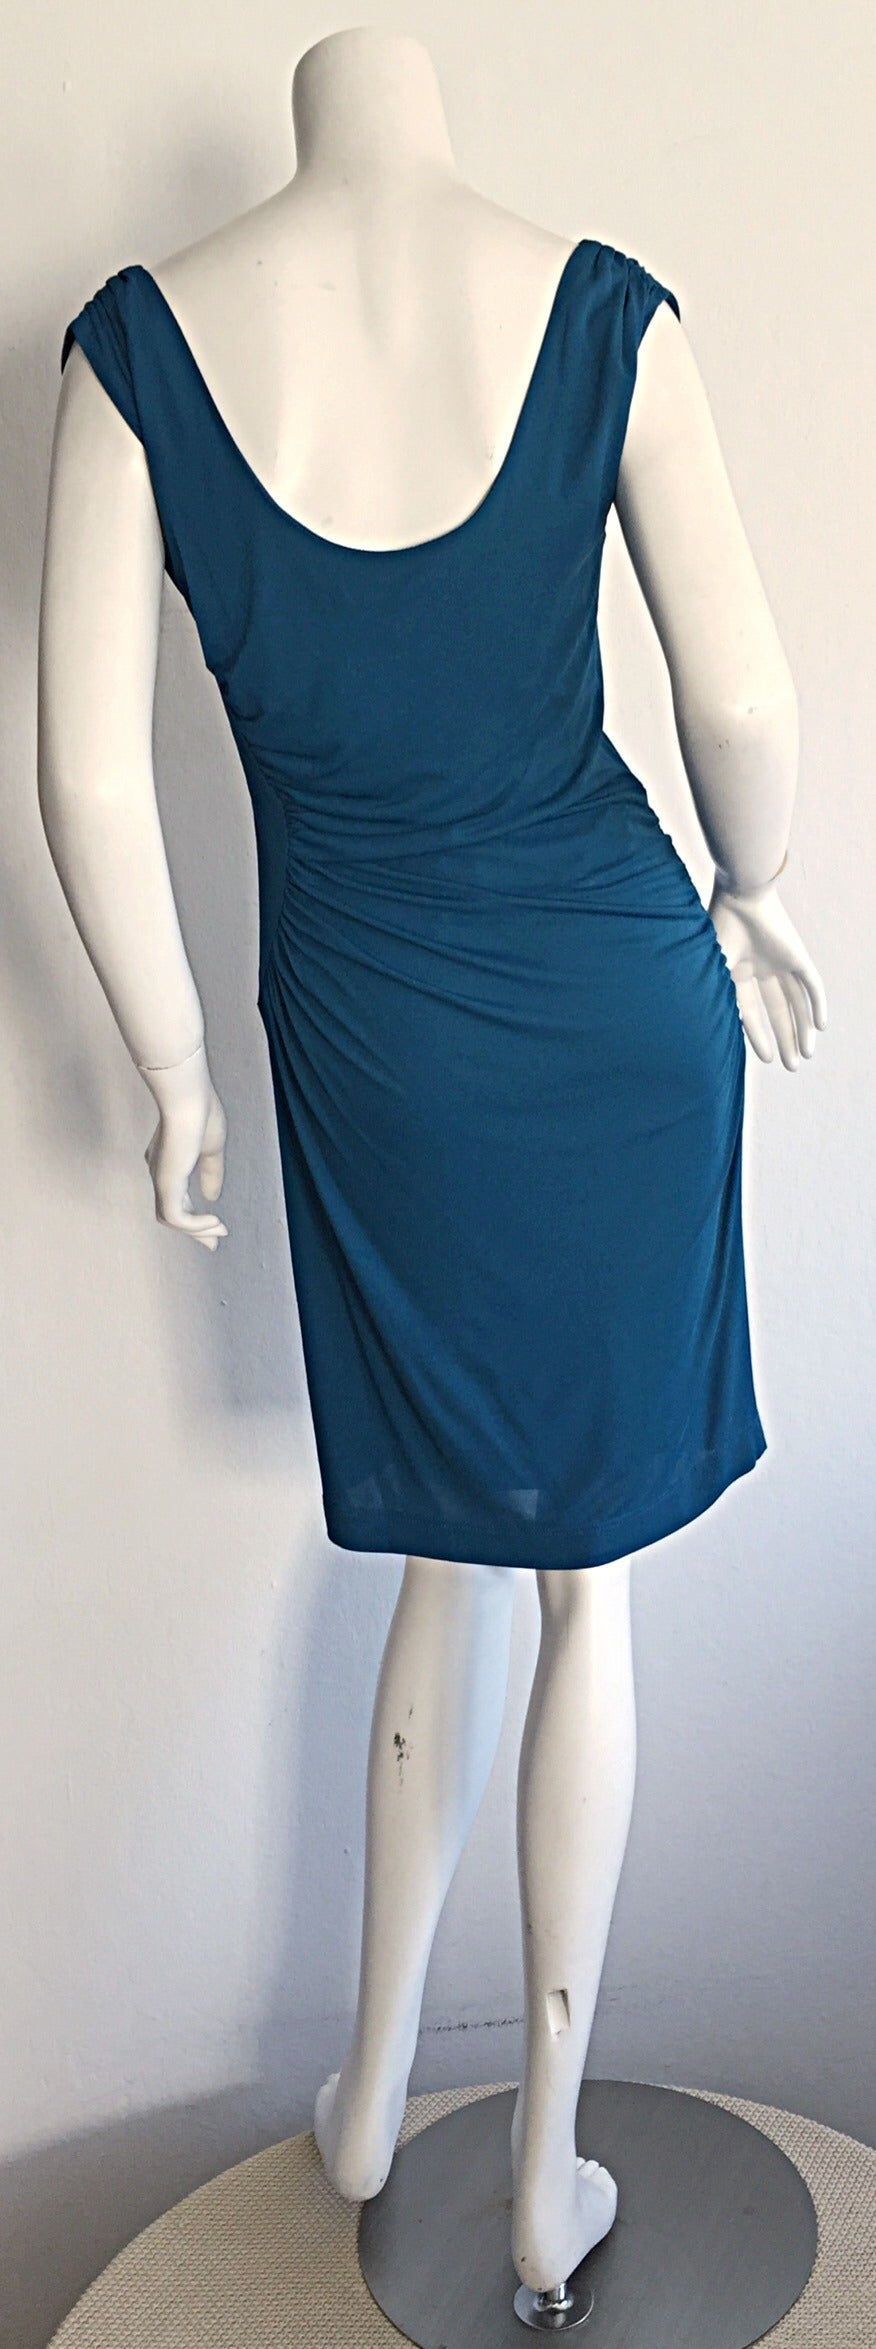 1990s Alberta Ferretti Size 6 / 8 Vintage Blue Jersey Draped Grecian Dress For Sale 3